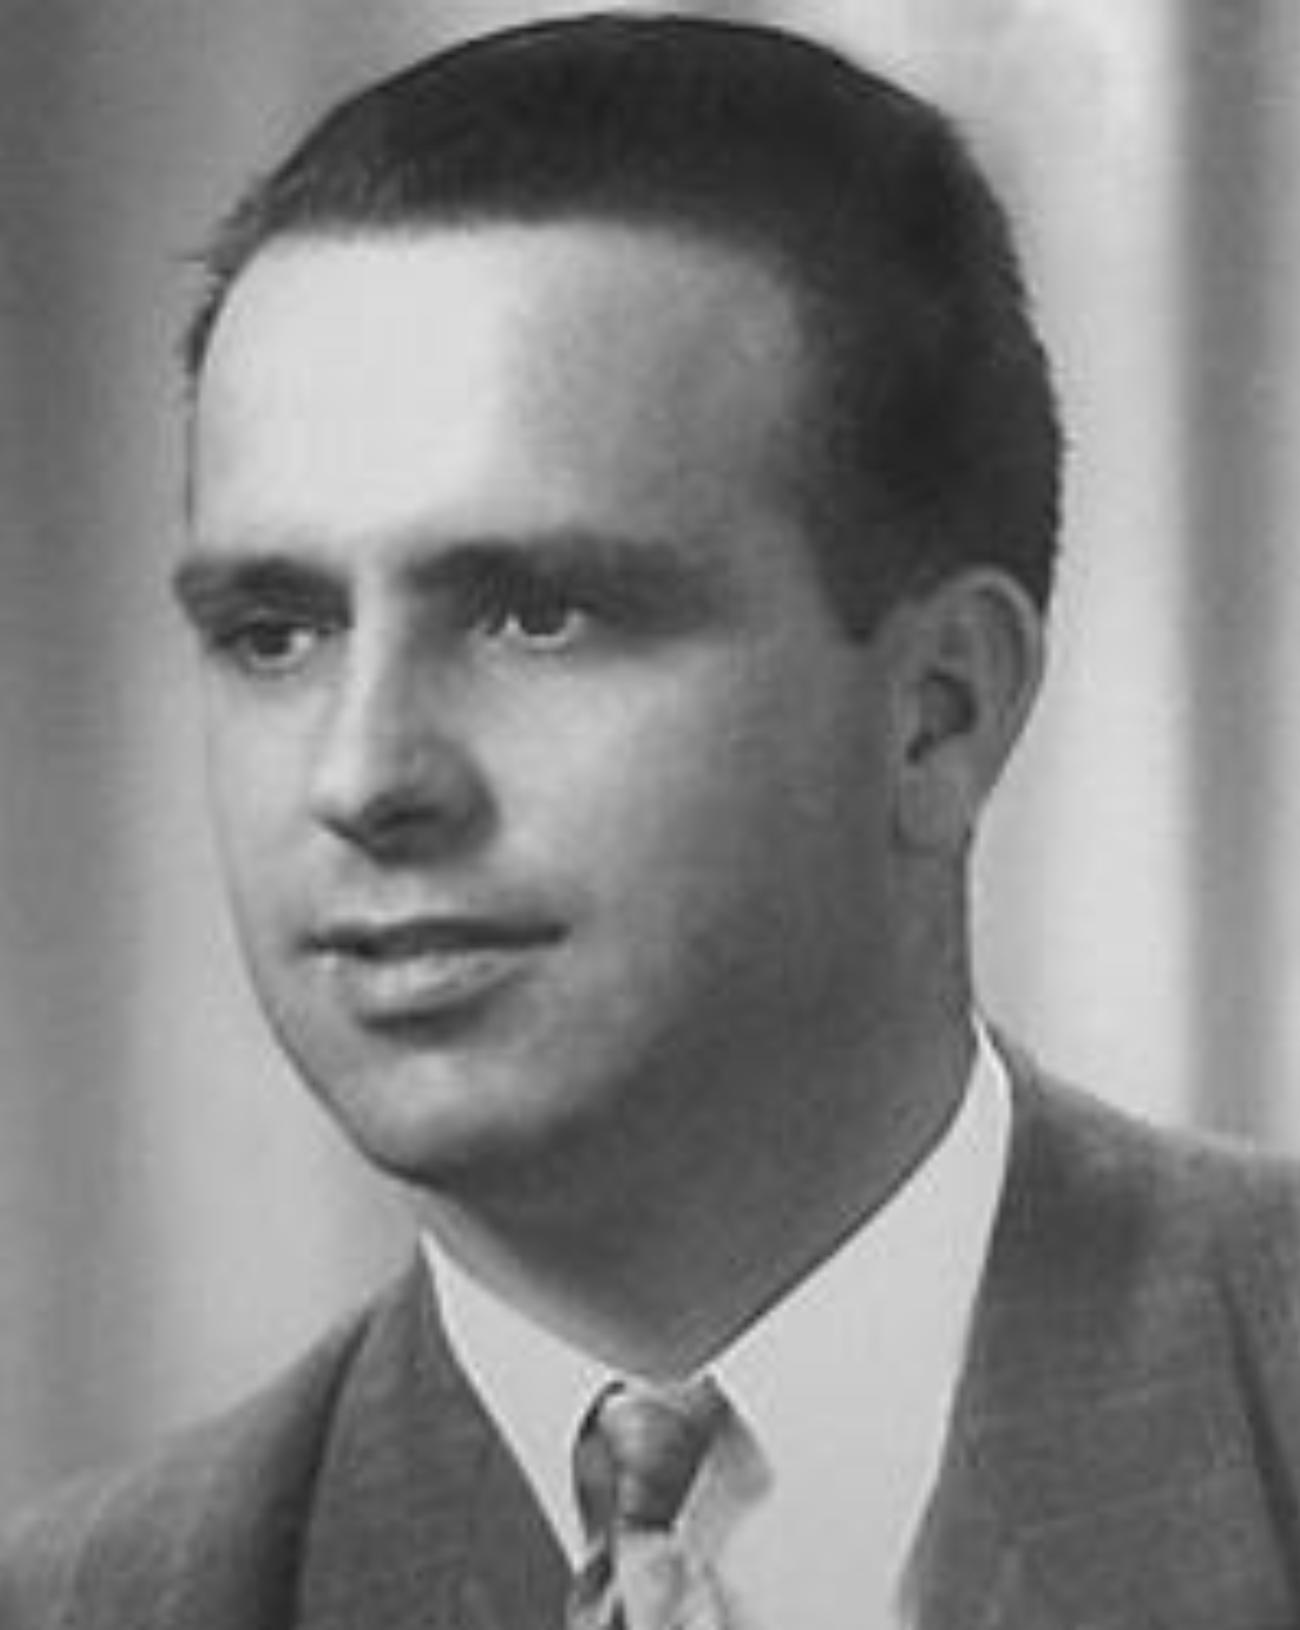 WILLARD W. GARVEY